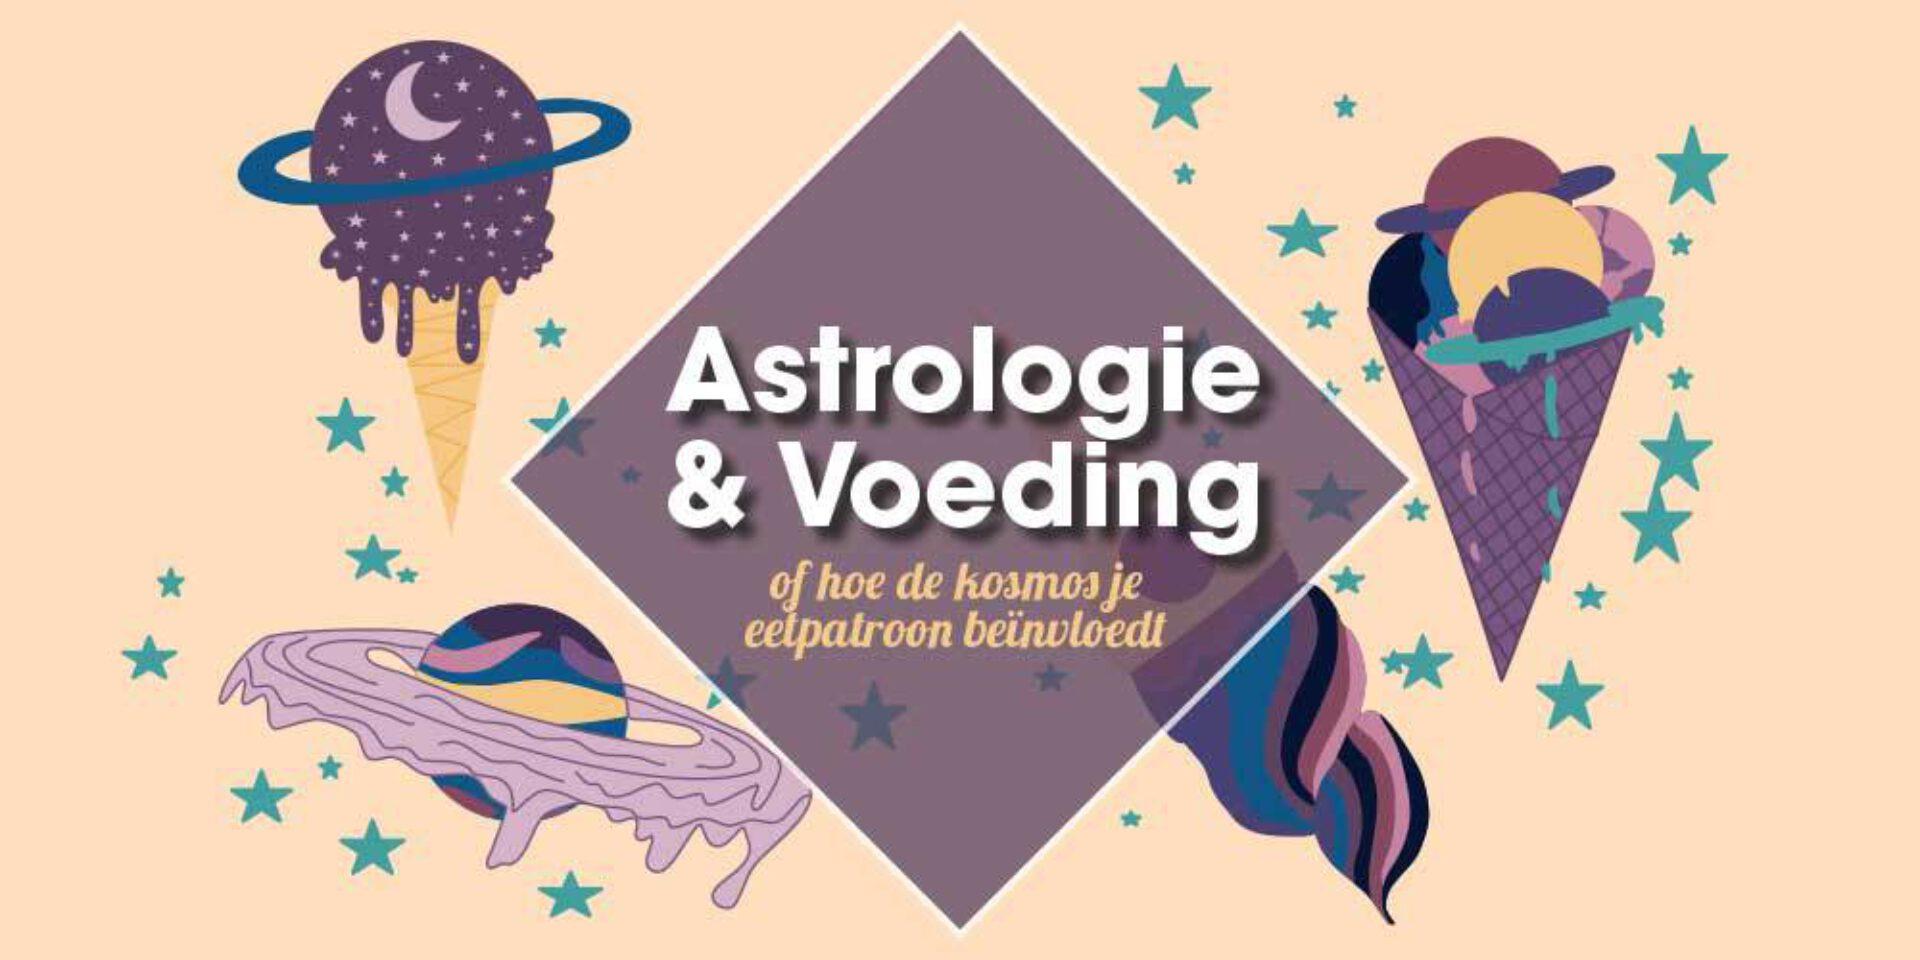 Astrologie en voeding: voedingsadvies op maat van je sterrenbeeld en element